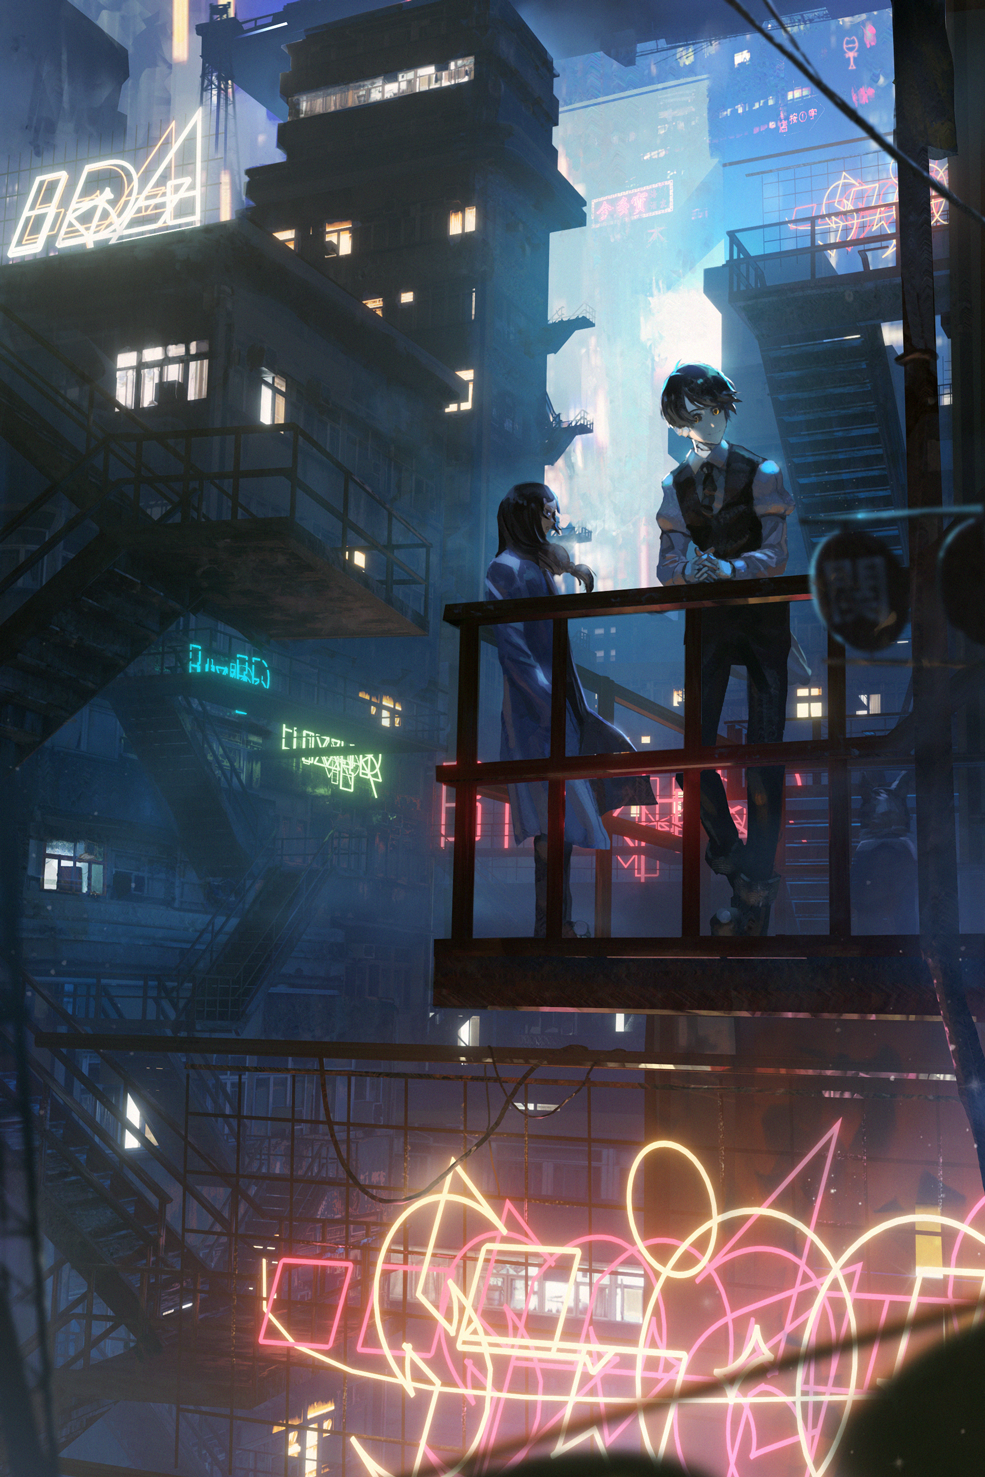 General 985x1477 va-11 hall-a cyberpunk anime city